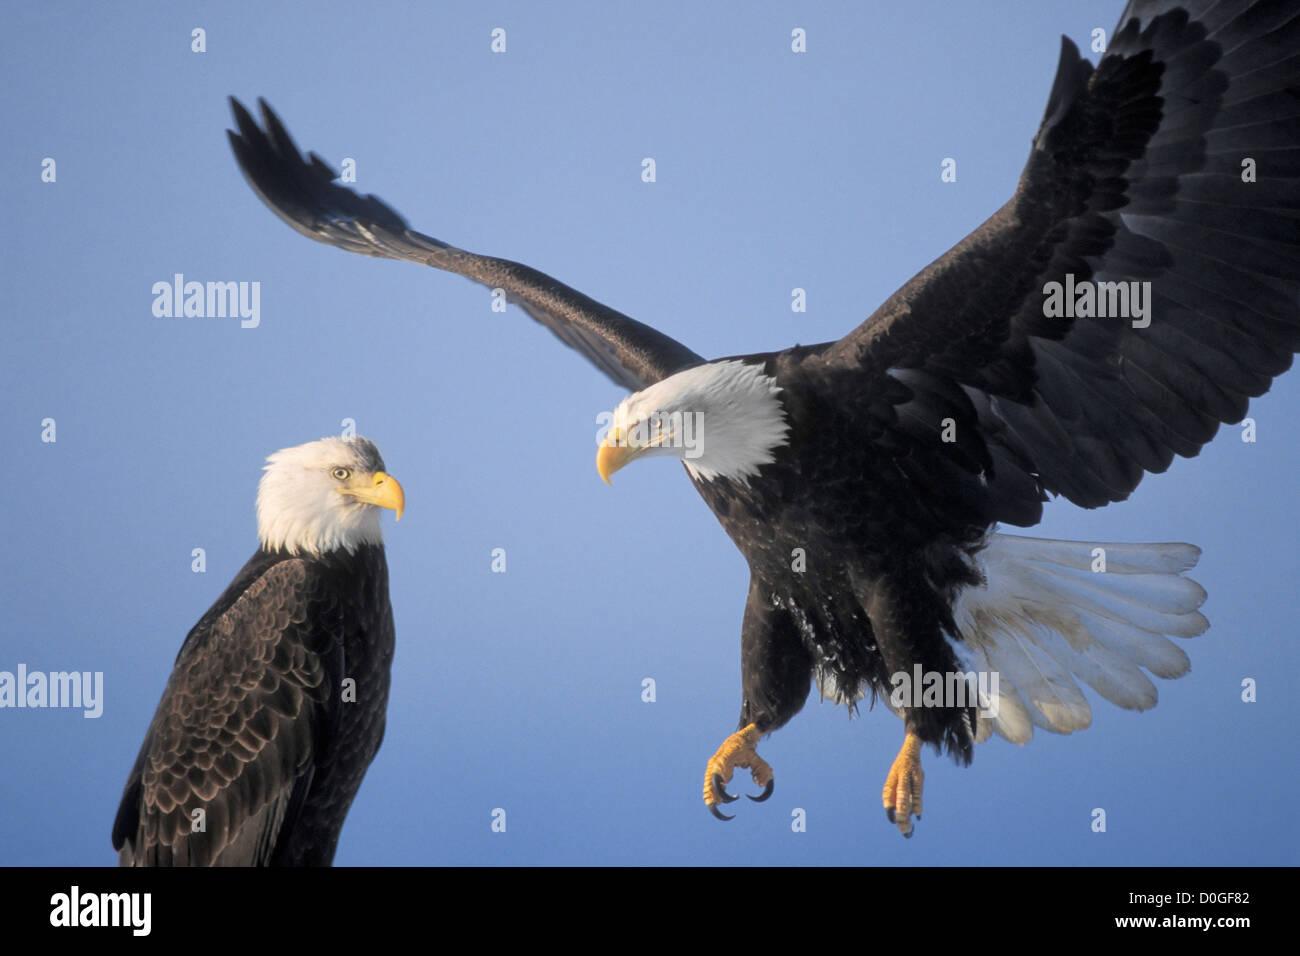 Two Bald Eagles in Homer, Alaska - Stock Image